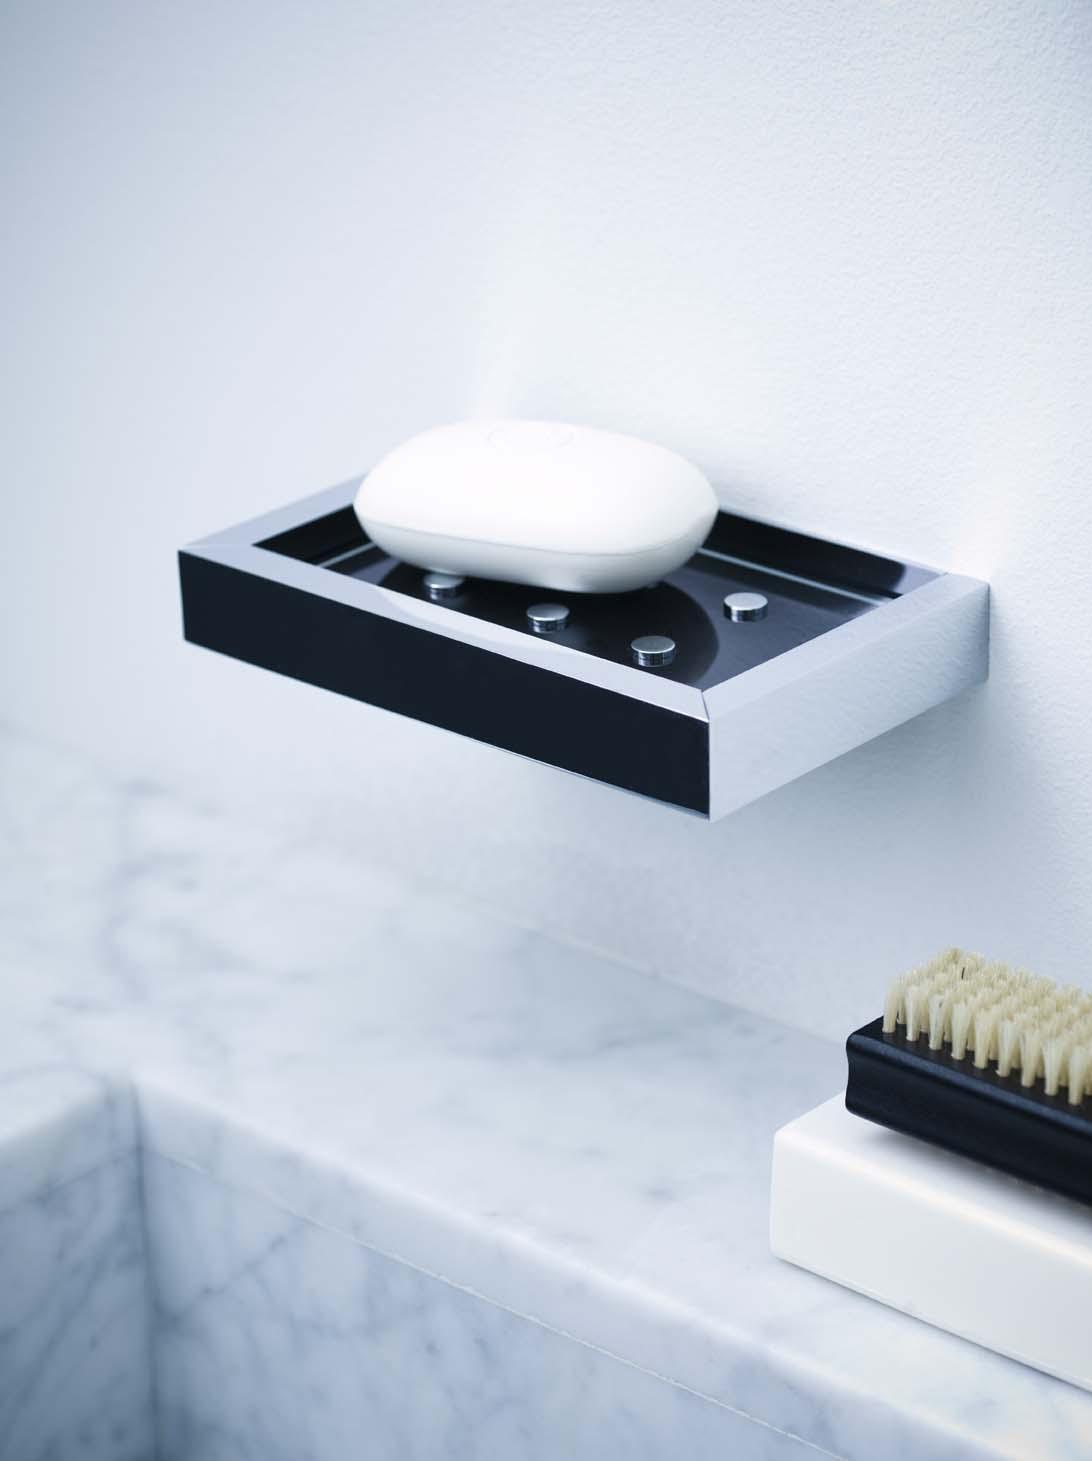 Cosmic, Pom dor, urban collection, bathrooms, Claire Davies designer